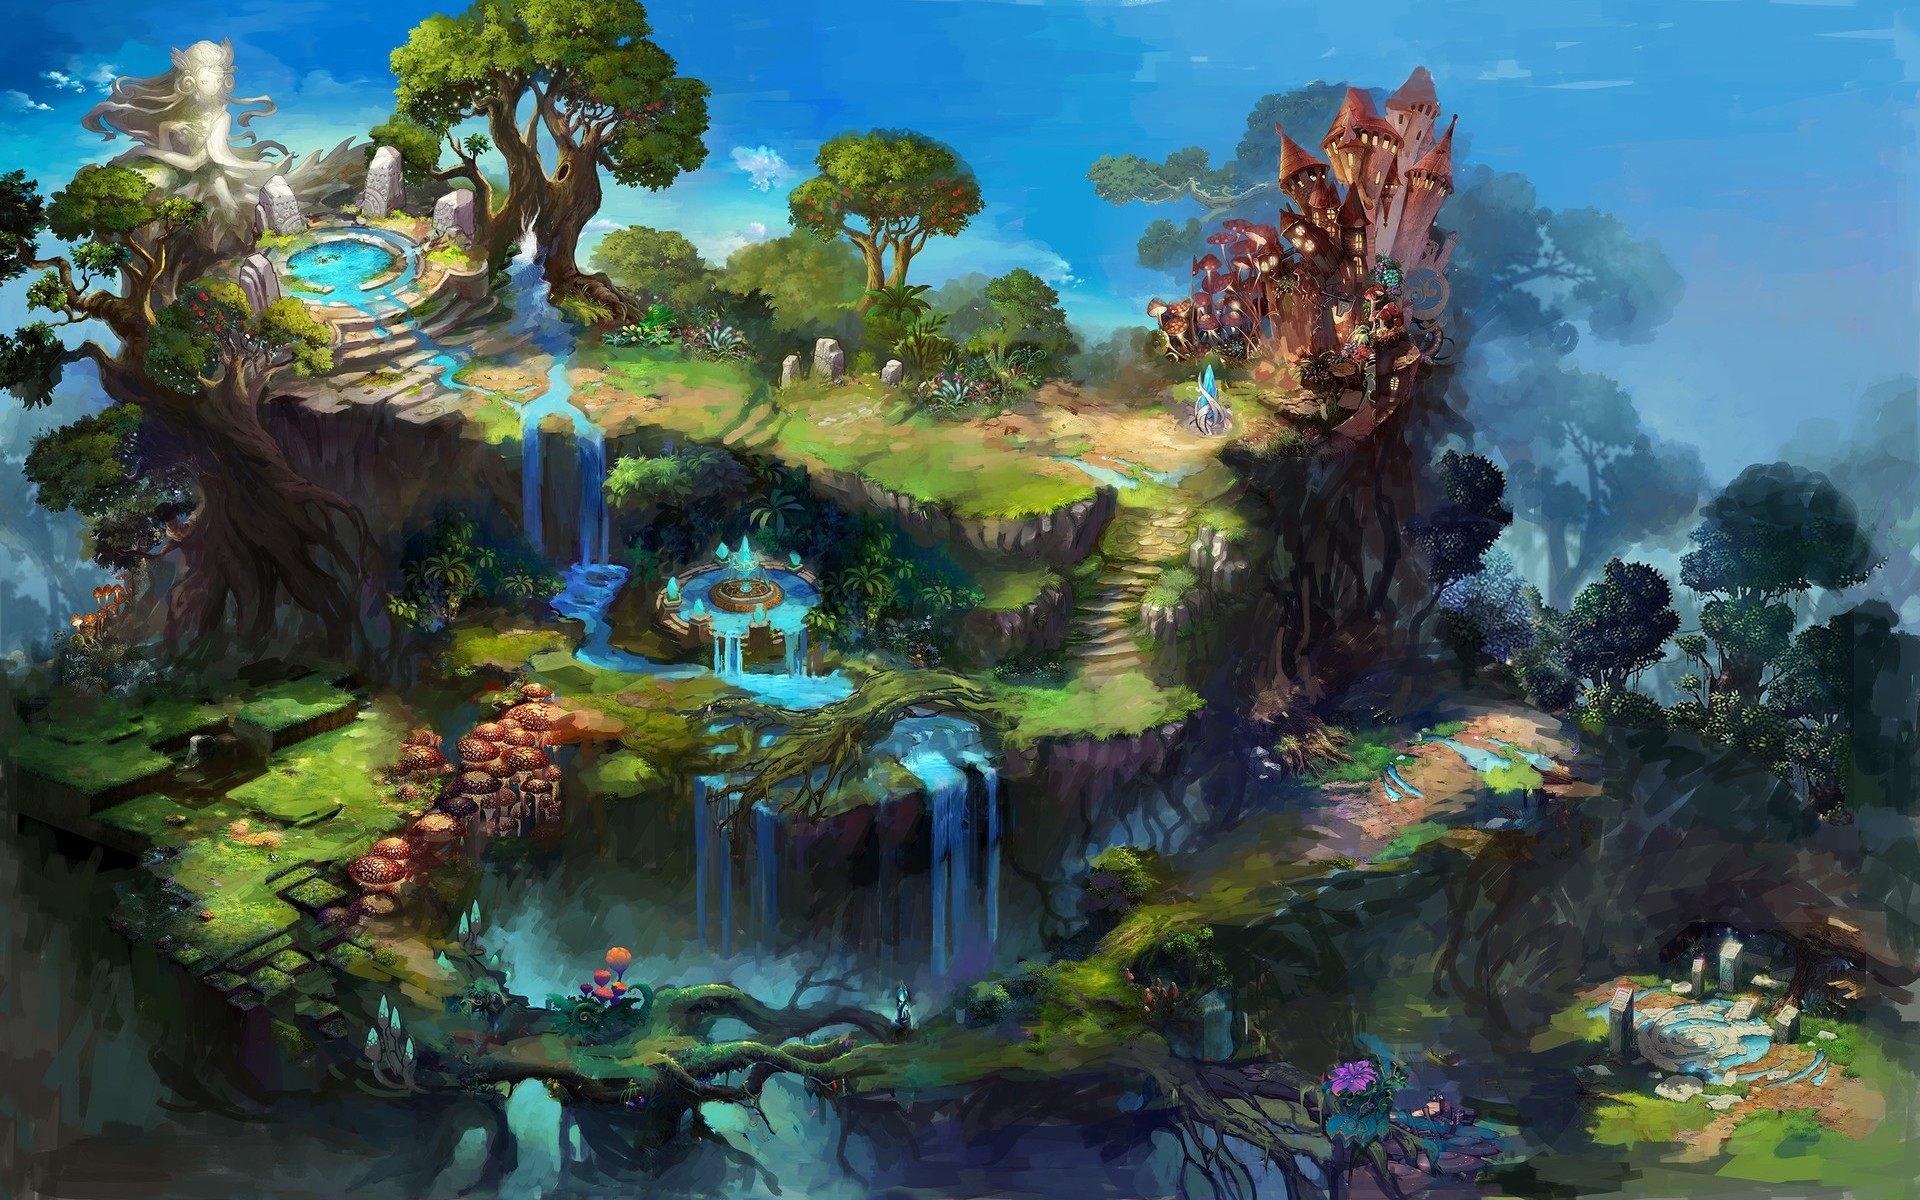 Res: 1920x1200, Fantasy Land HD Wallpaper For Desktop, Laptop & Mobile